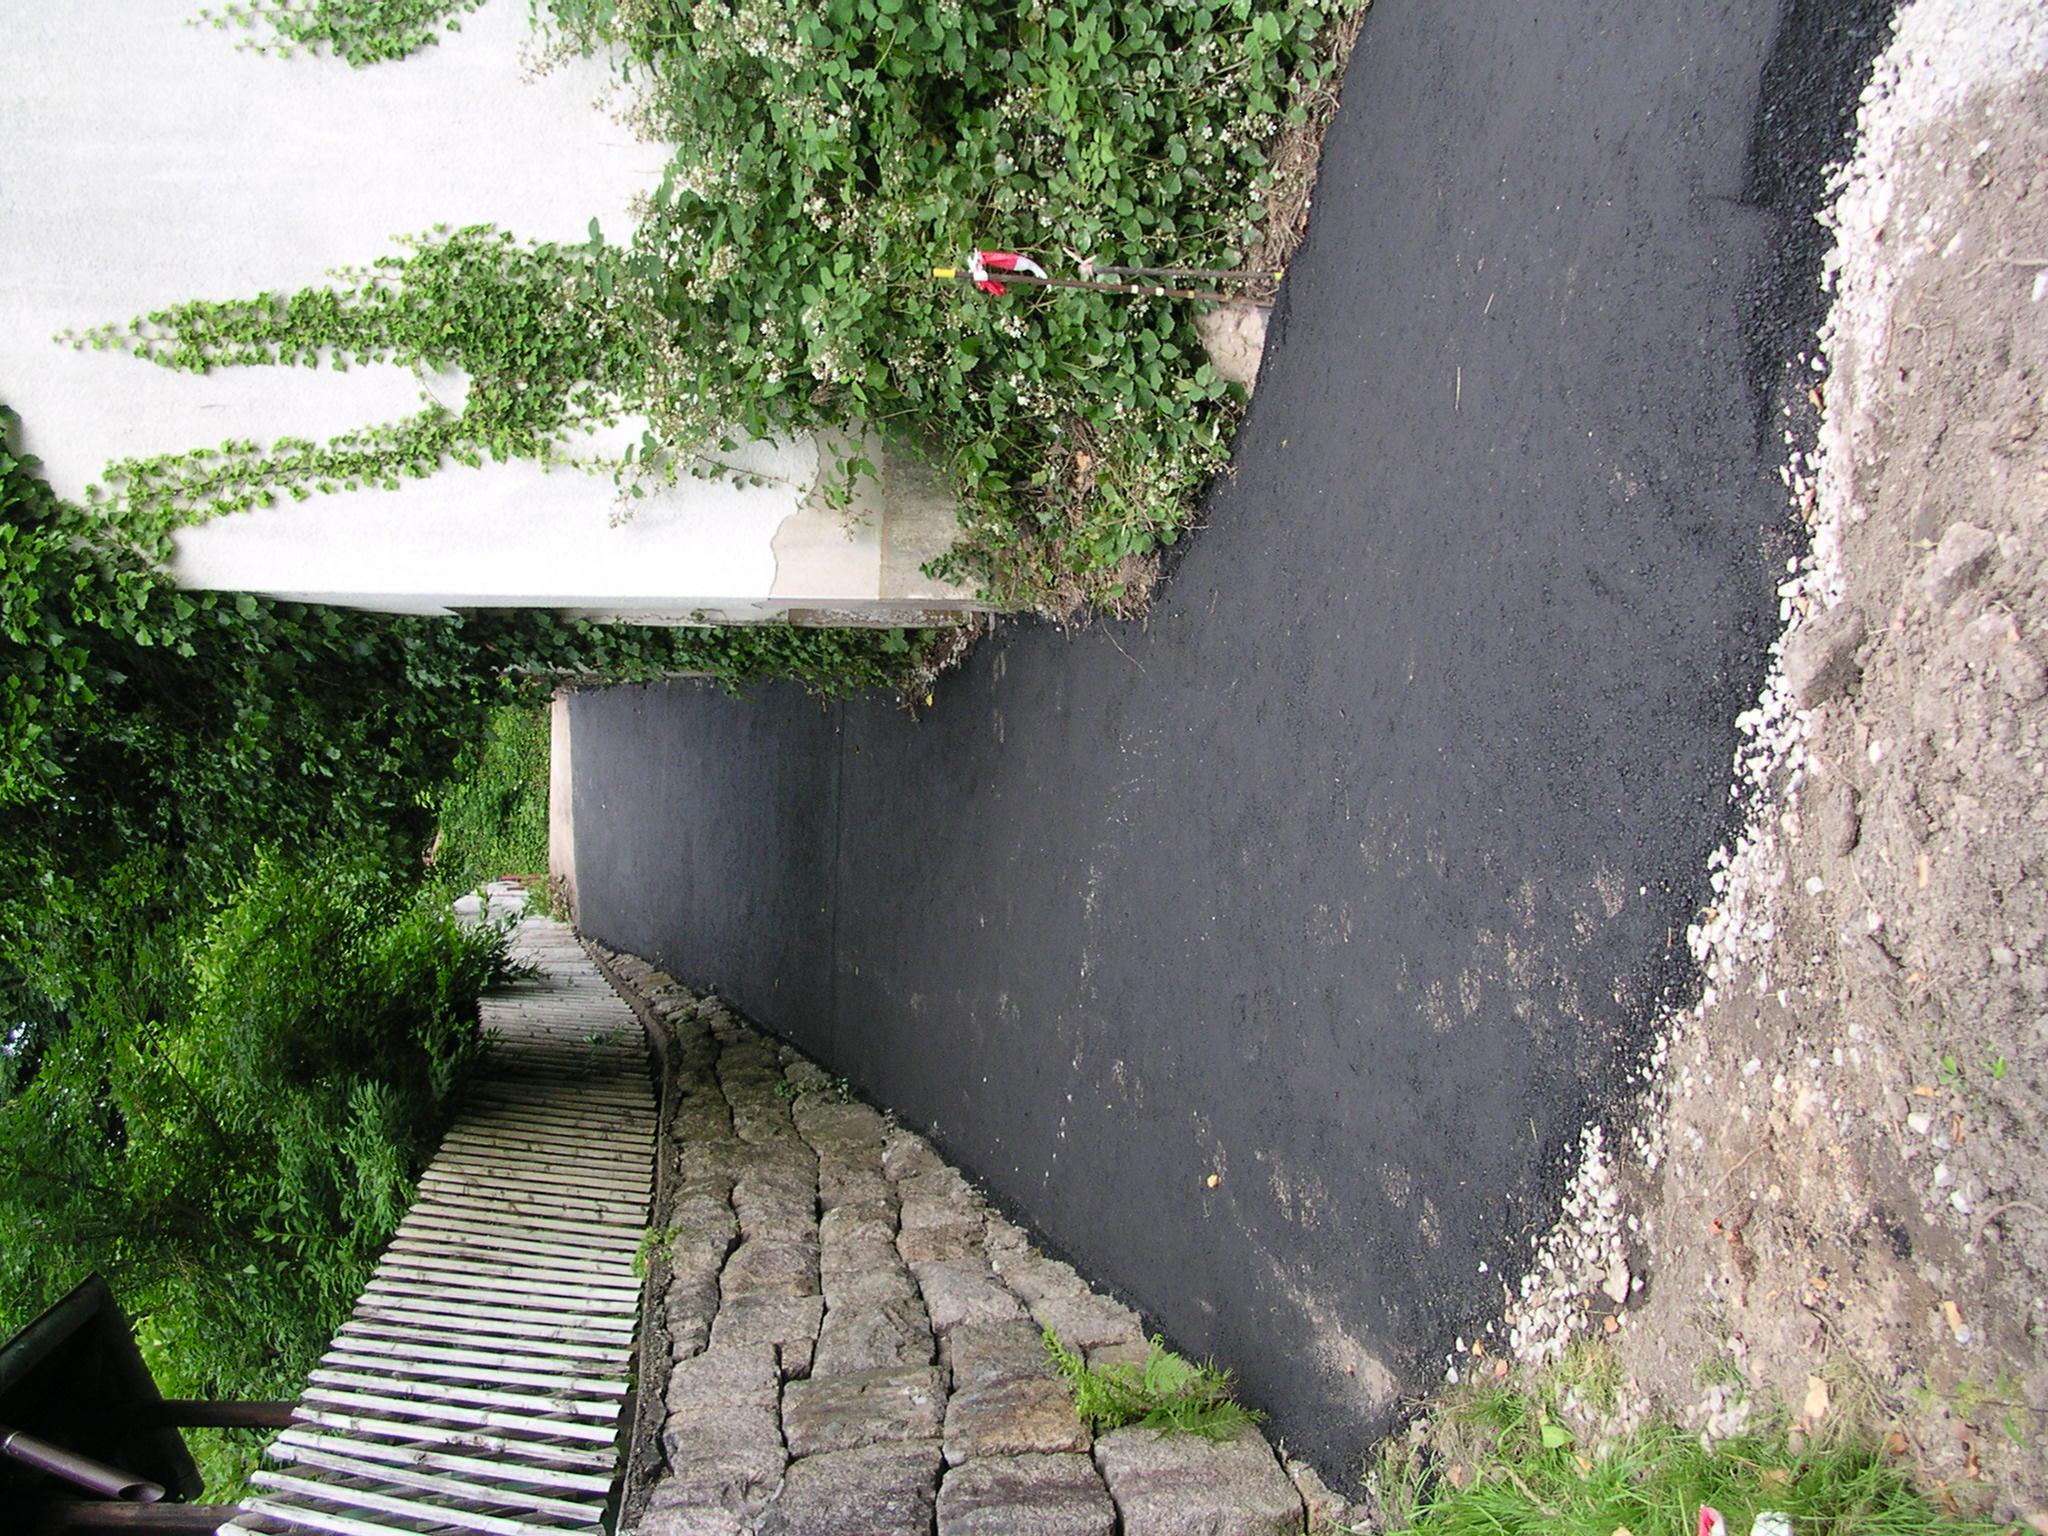 Neuer Zugangsweg zum Sportplatz Langenbrand (12)